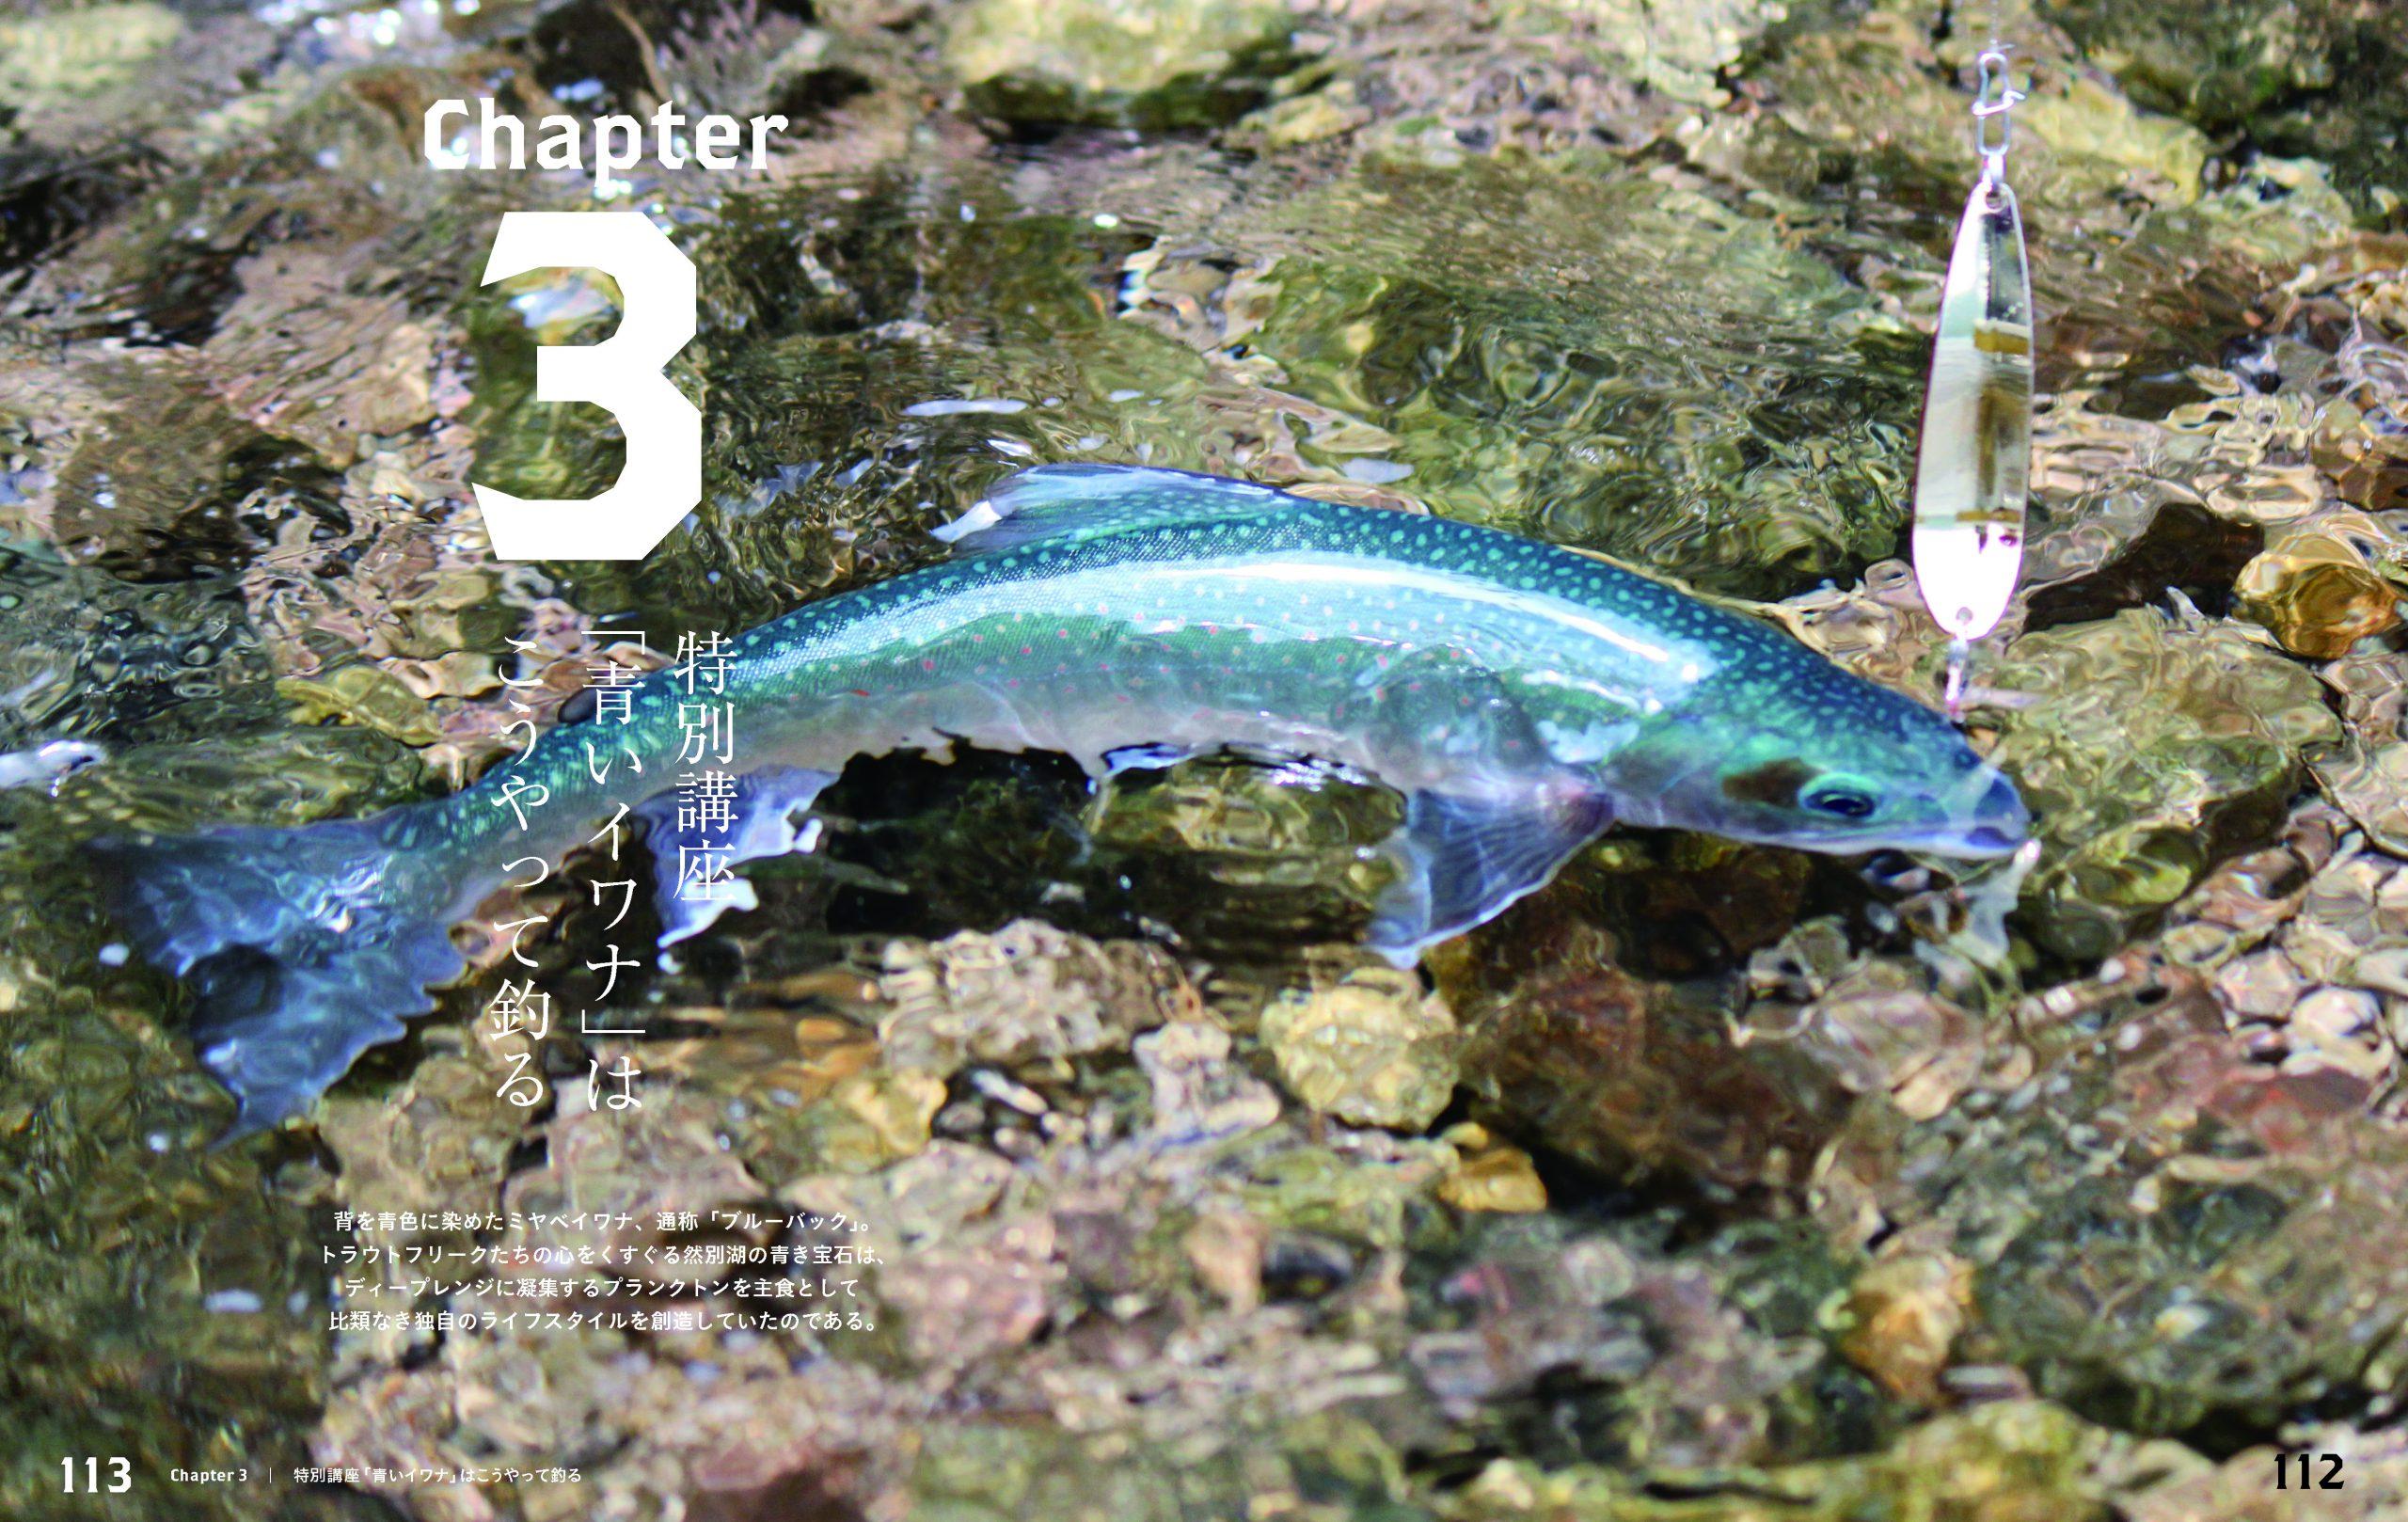 feat.鱒 本文P112-113特別講座「青いイワナ」はこうやって釣る